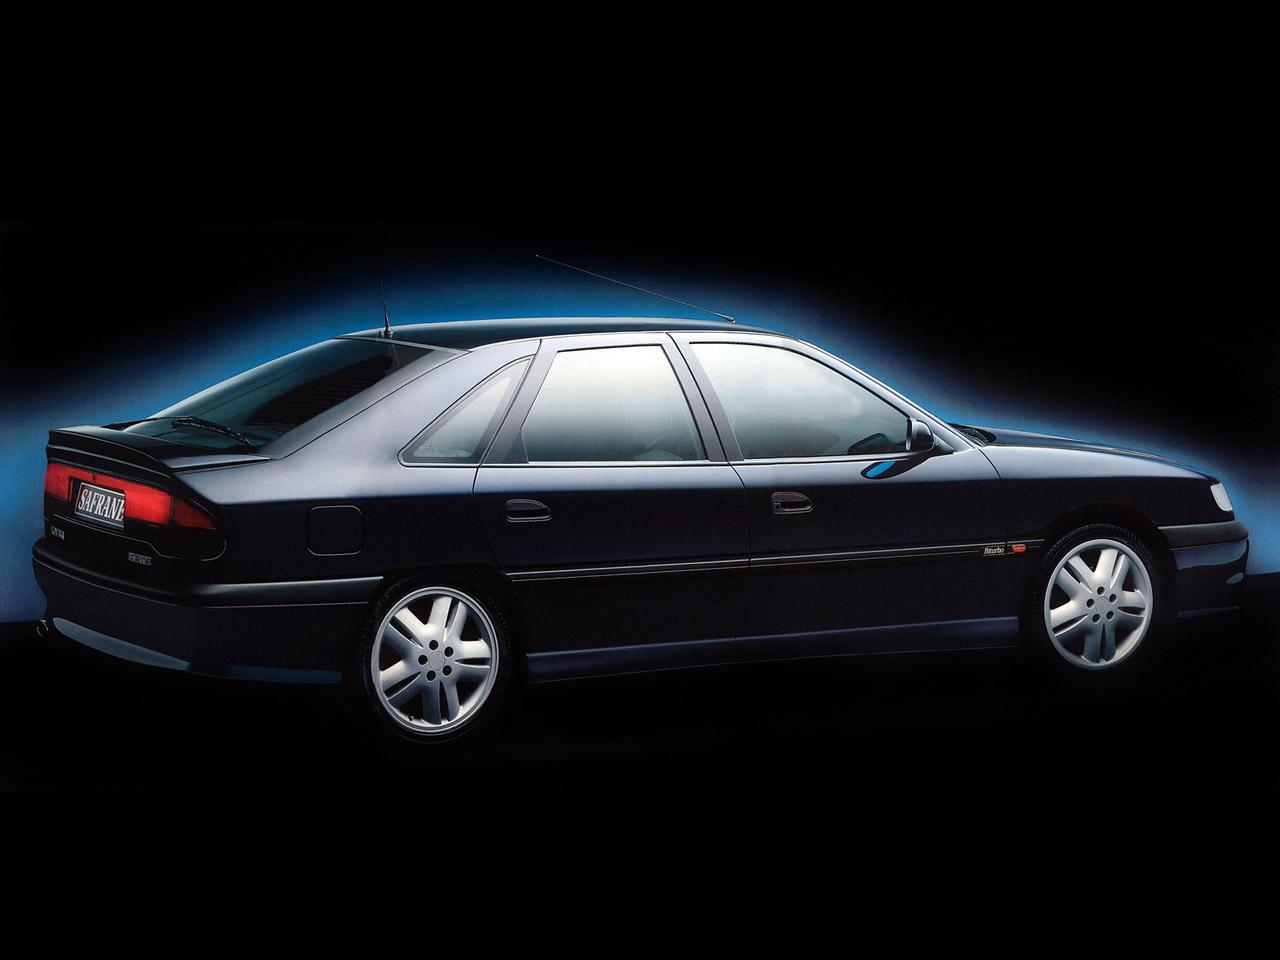 renault_safrane-bi-turbo-1993-96_r3_jpg.jpg